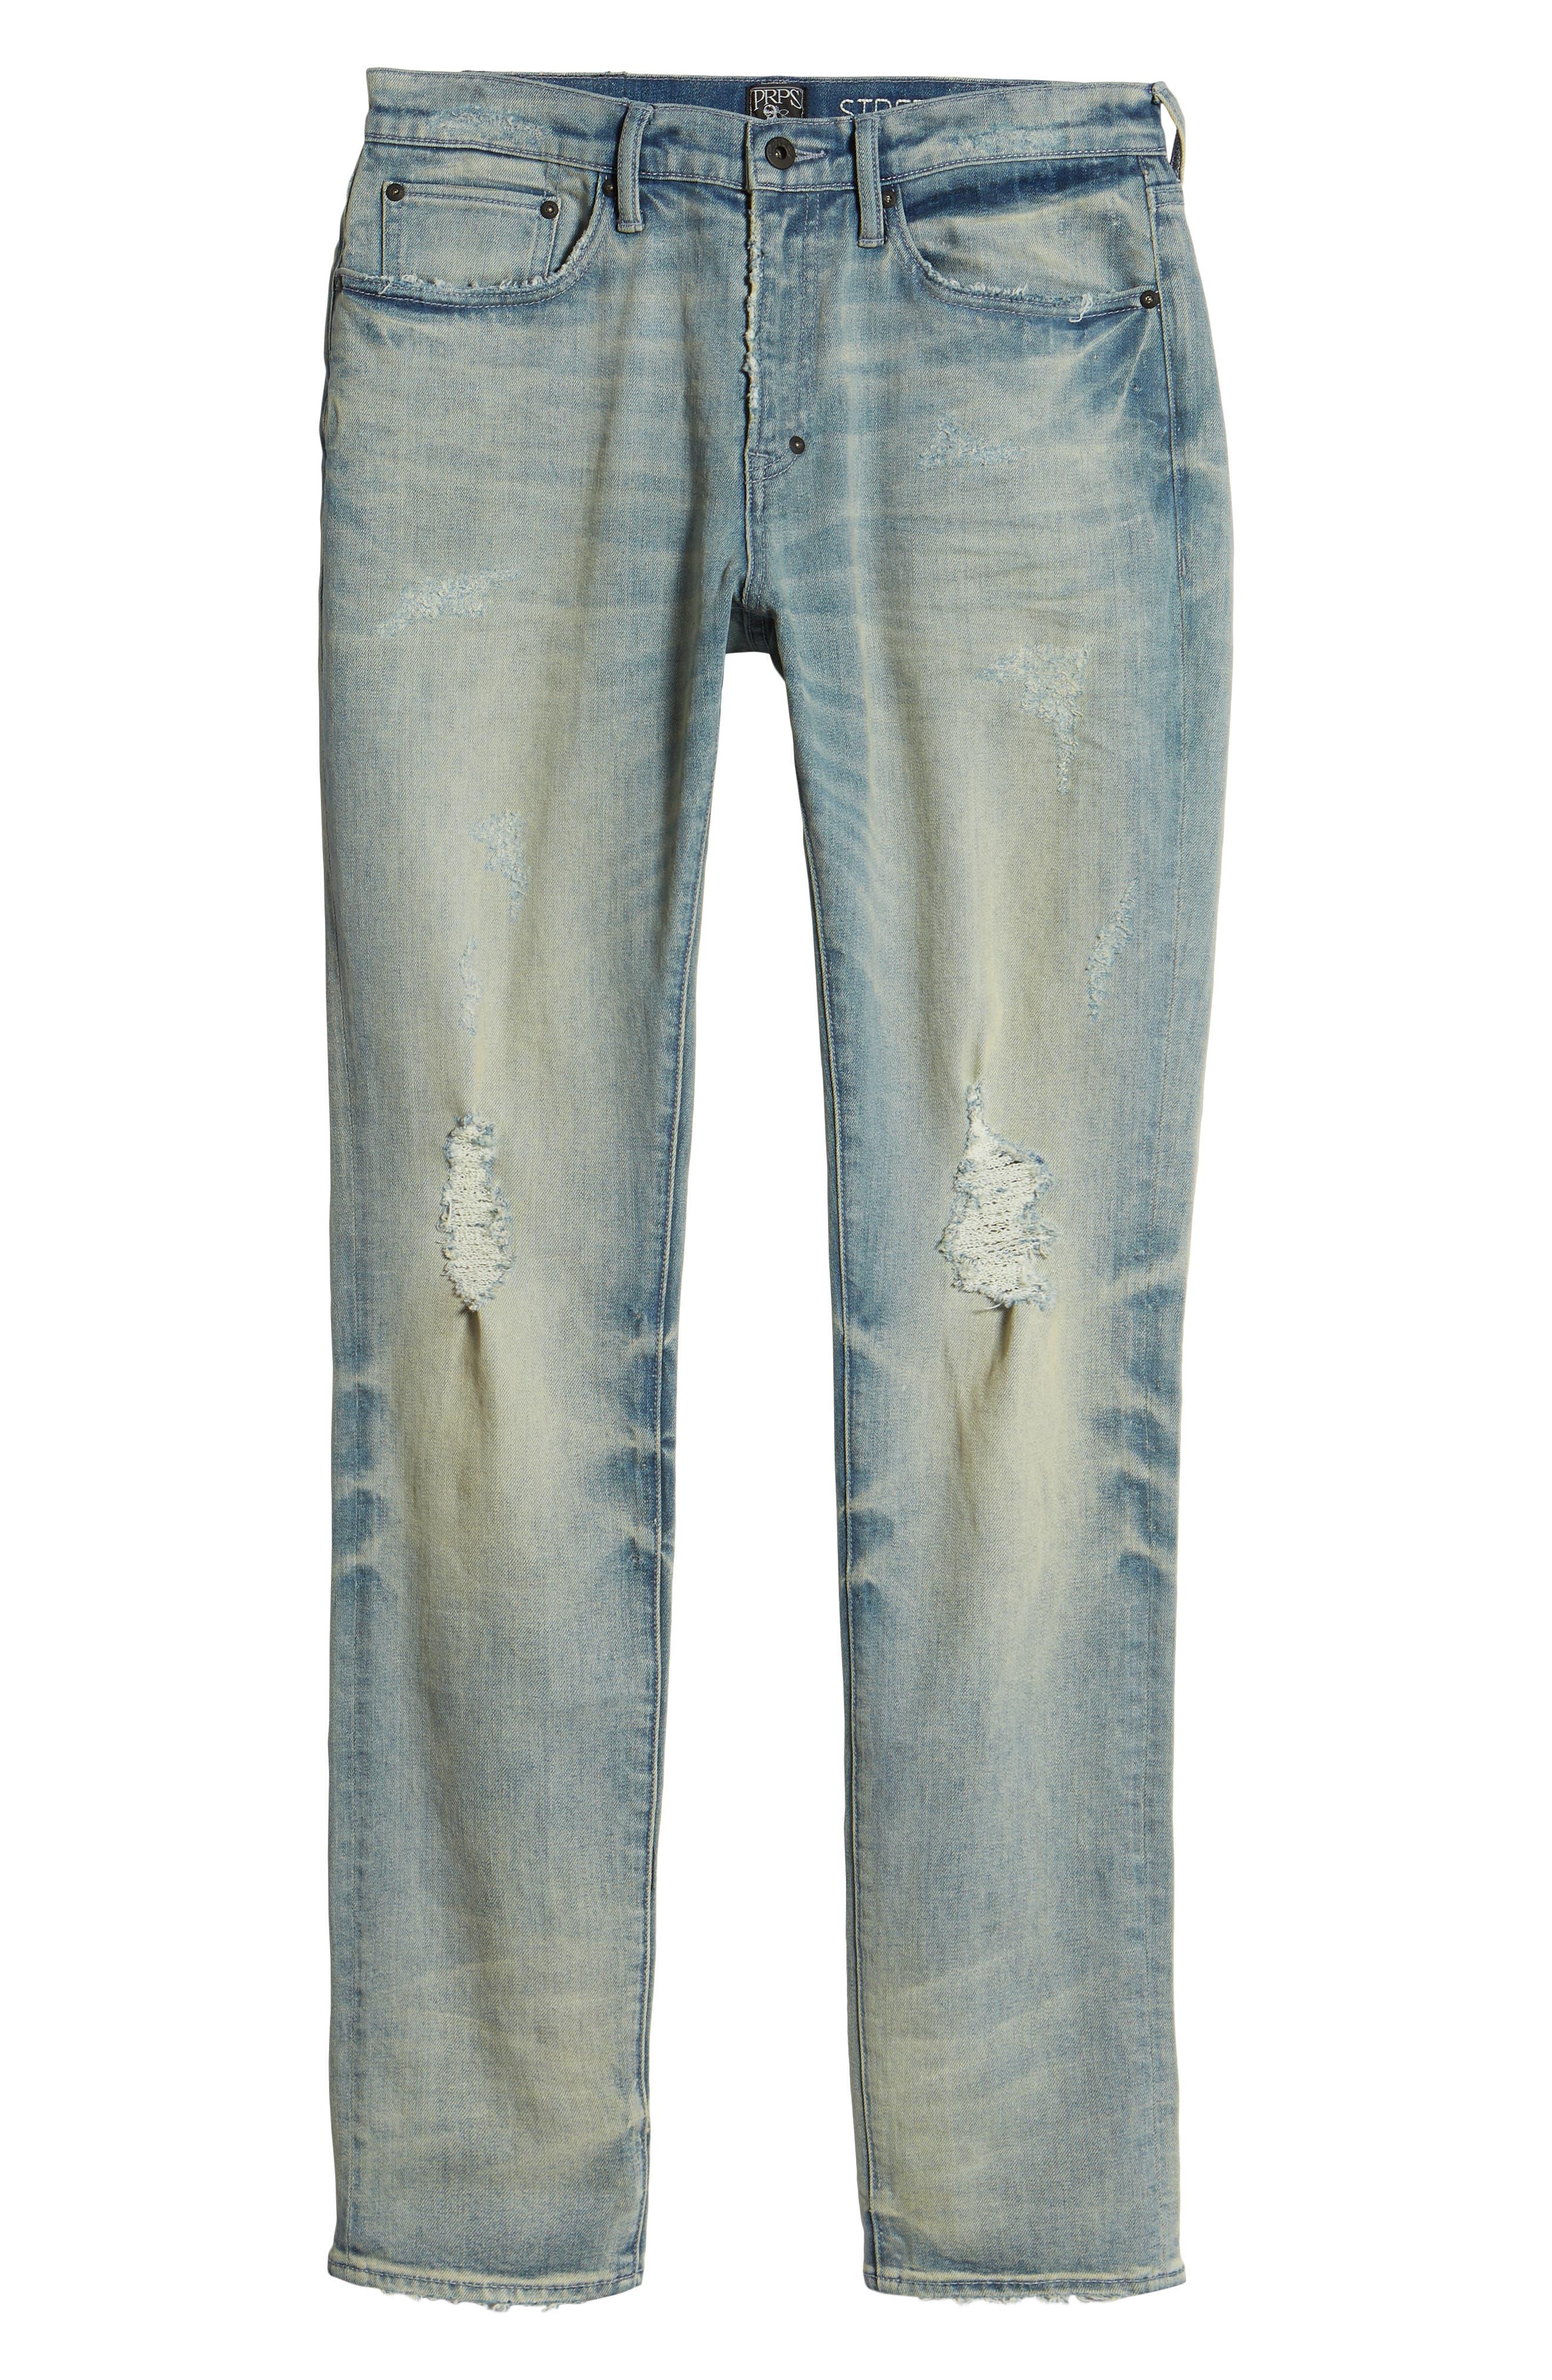 Windsor Slim Fit Jeans,                             Alternate thumbnail 6, color,                             LANGUID